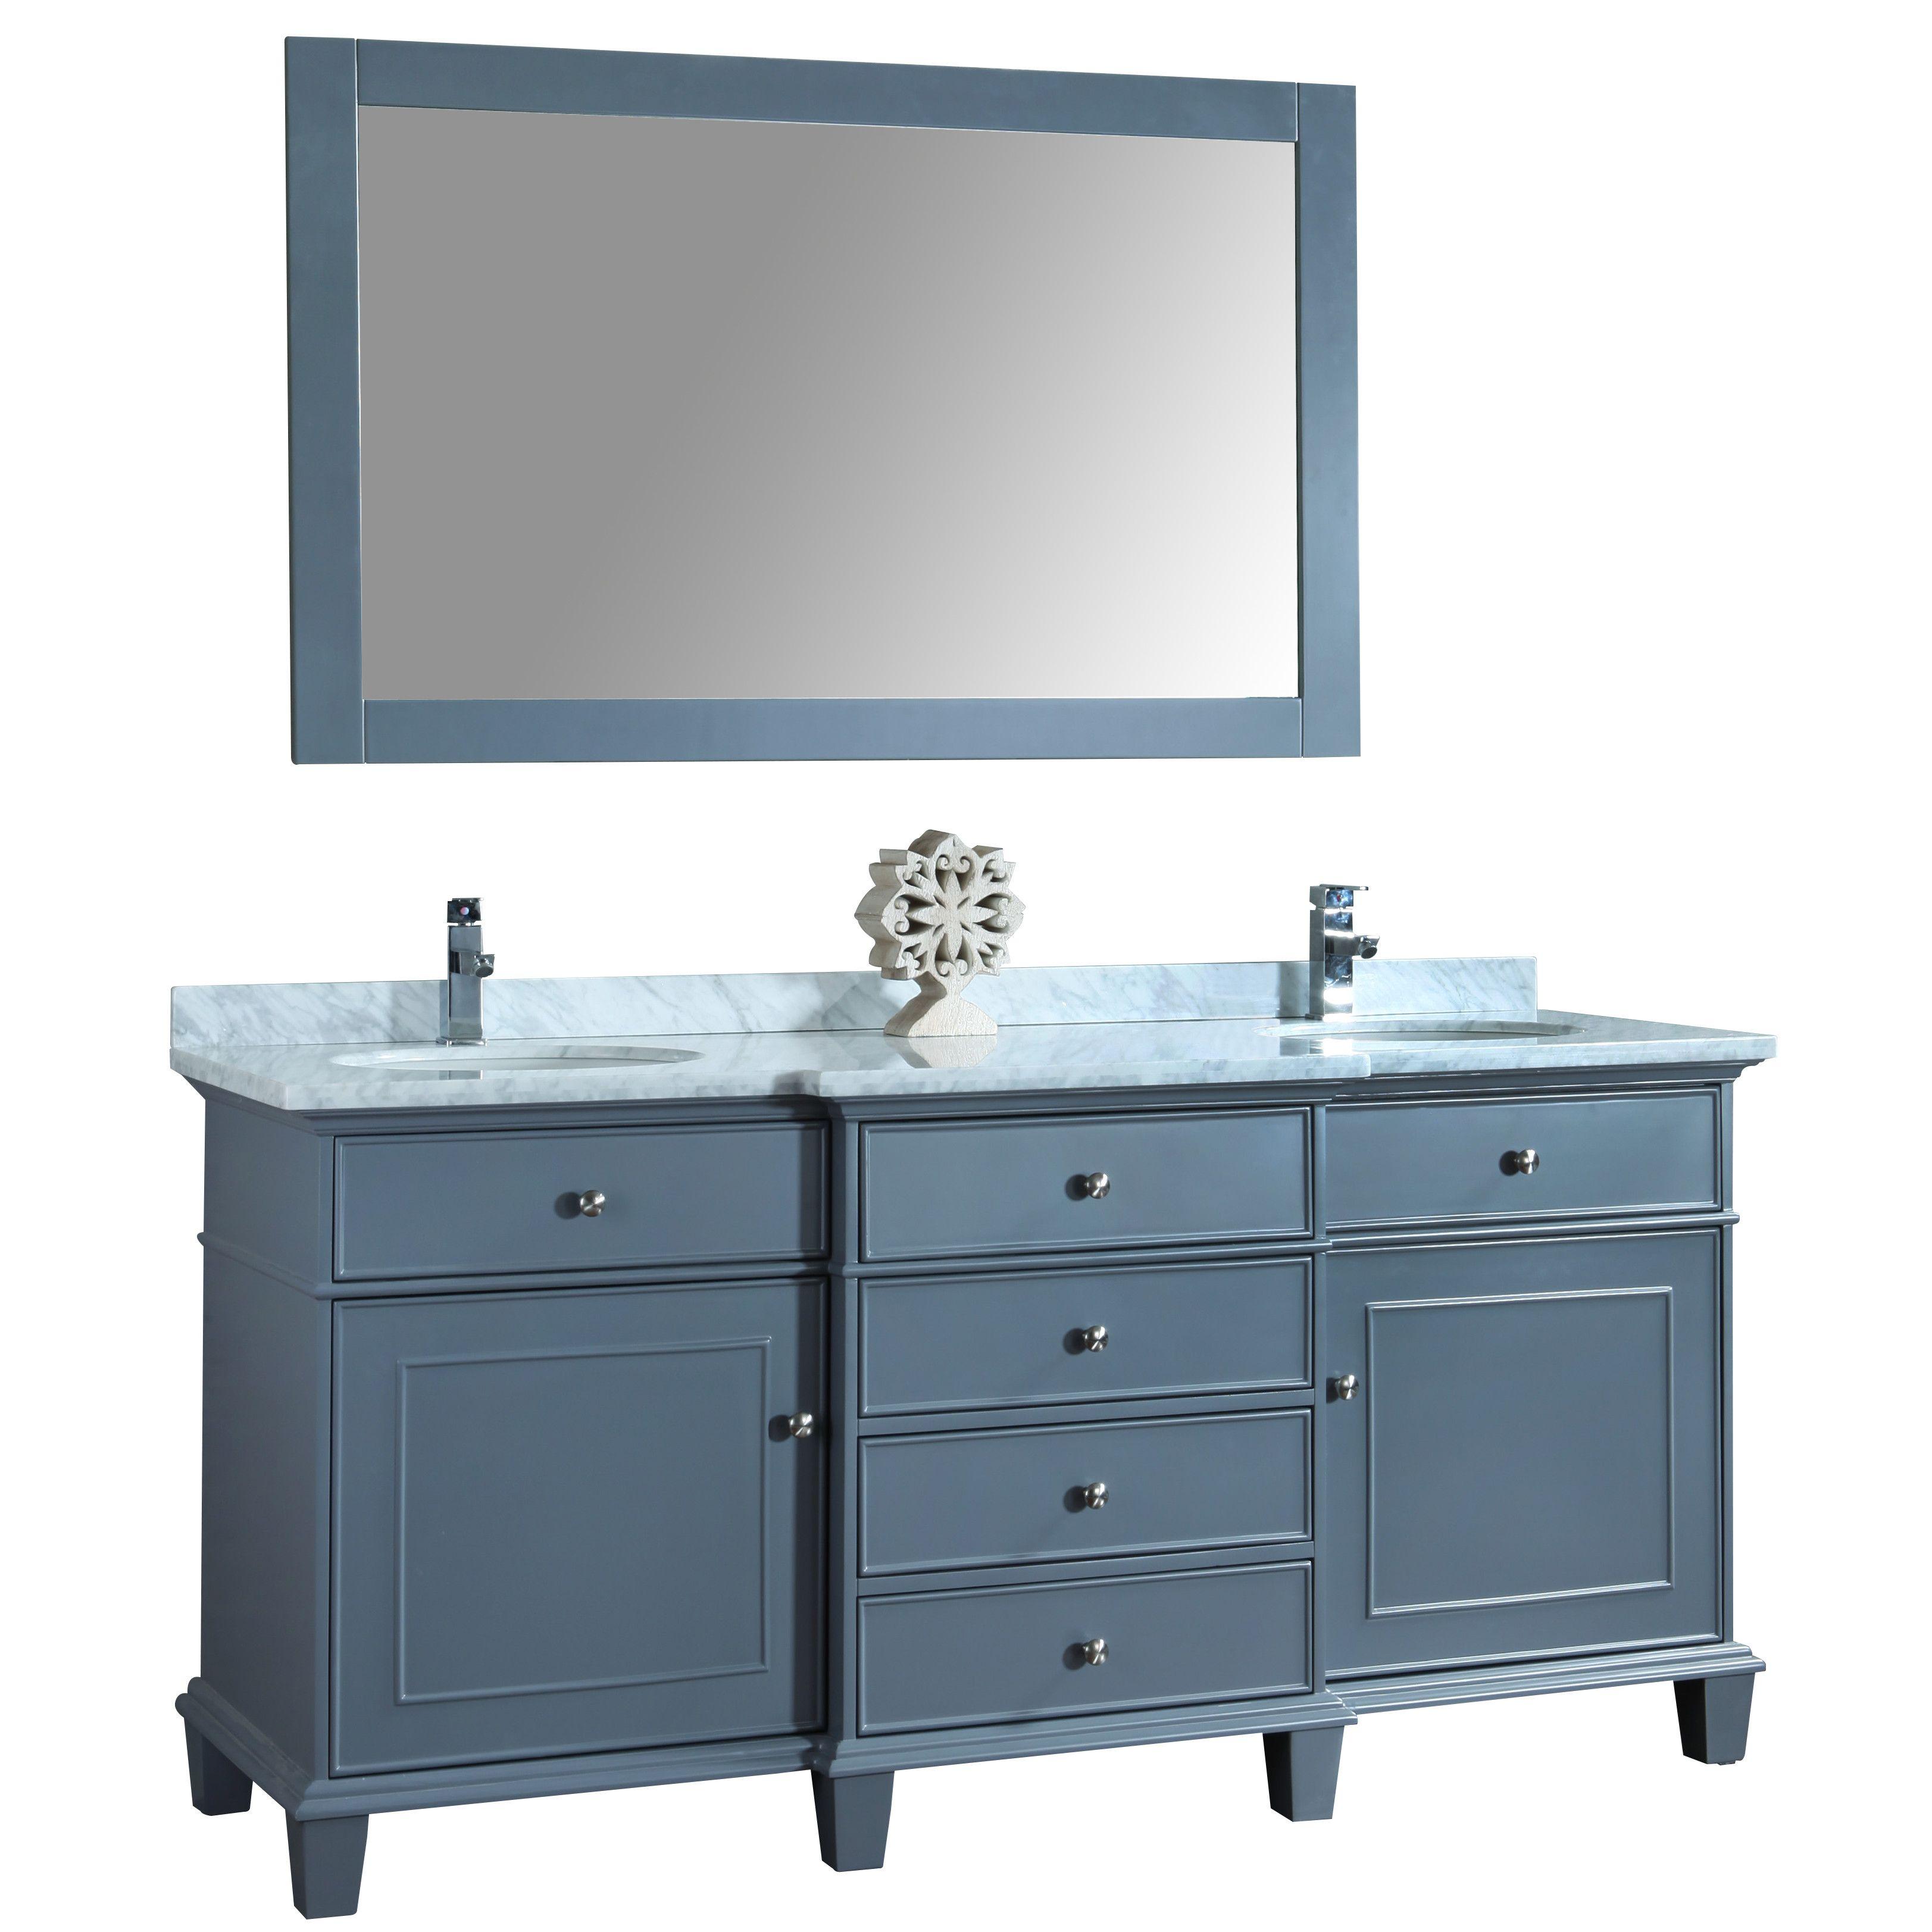 make makeup inch cheap with best bathroom drawers table size vanities corner narrow full wonderful lights of set lighted desk wayfair antique vanity depth dressing